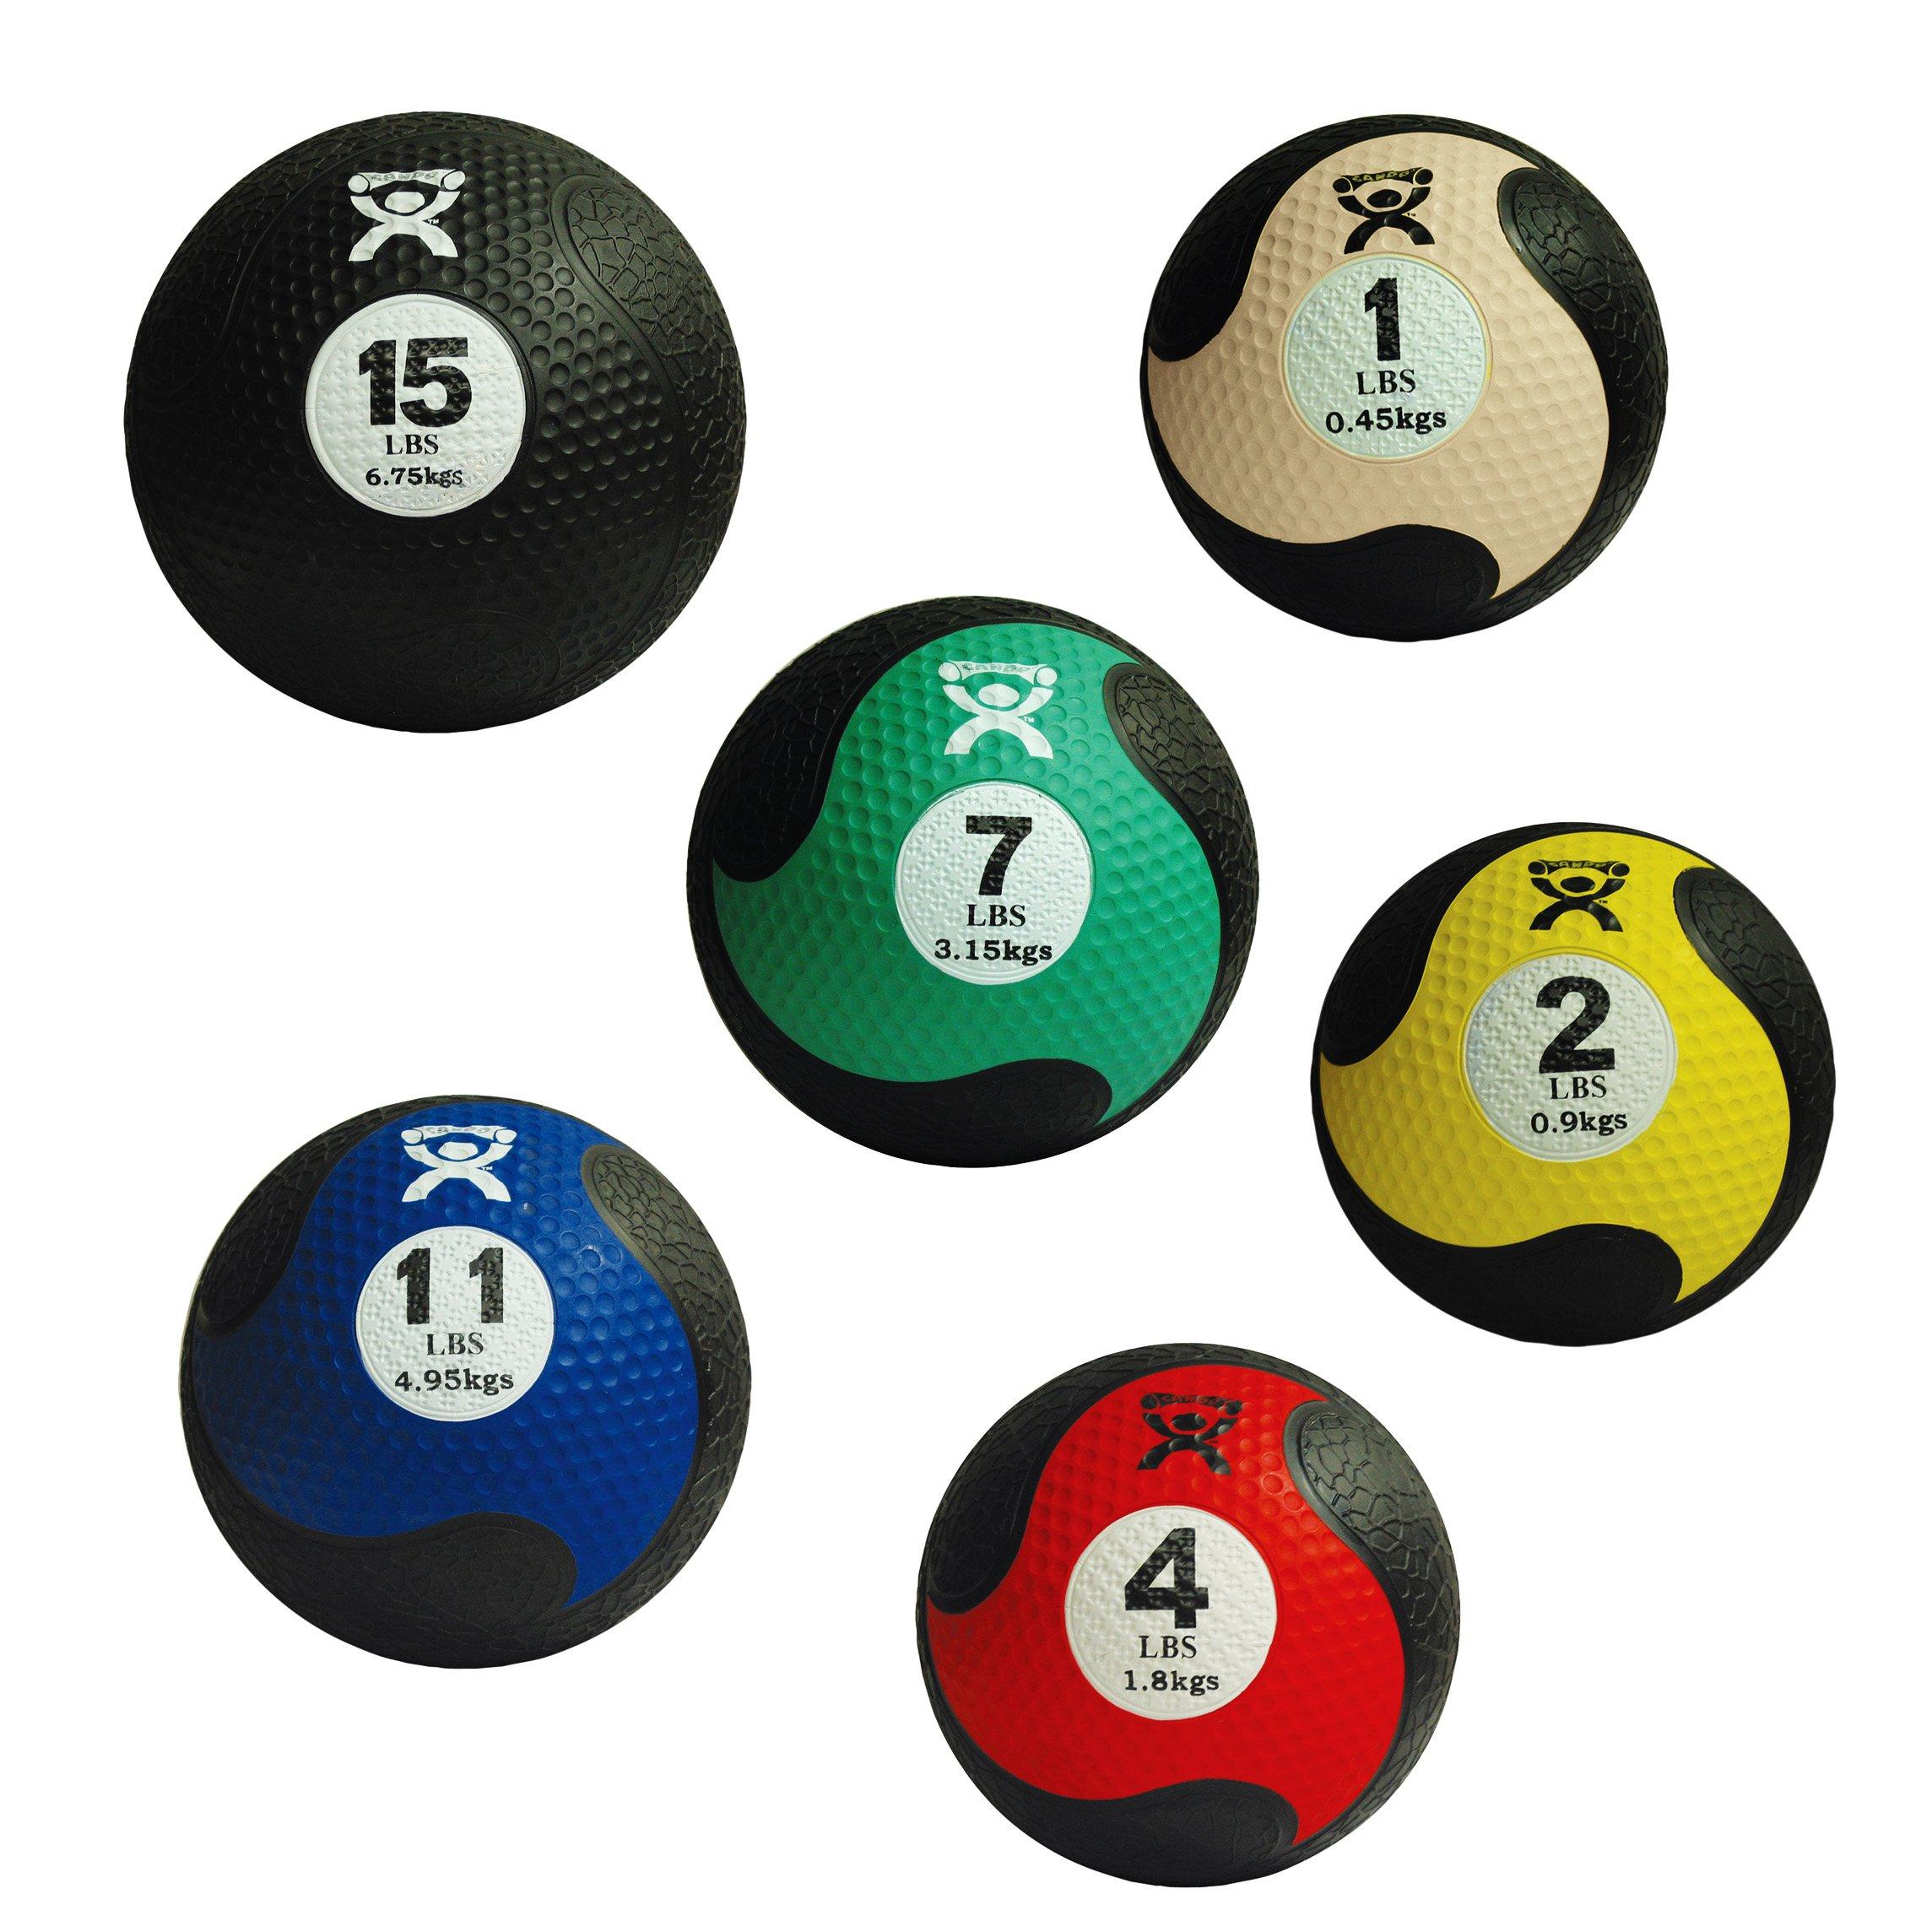 Cando Firm Fitness Medicine Balls - 6-Piece Bundle - 1 Each: 1, 2, 4, 7, 11, 15 LB by Cando (Image #1)